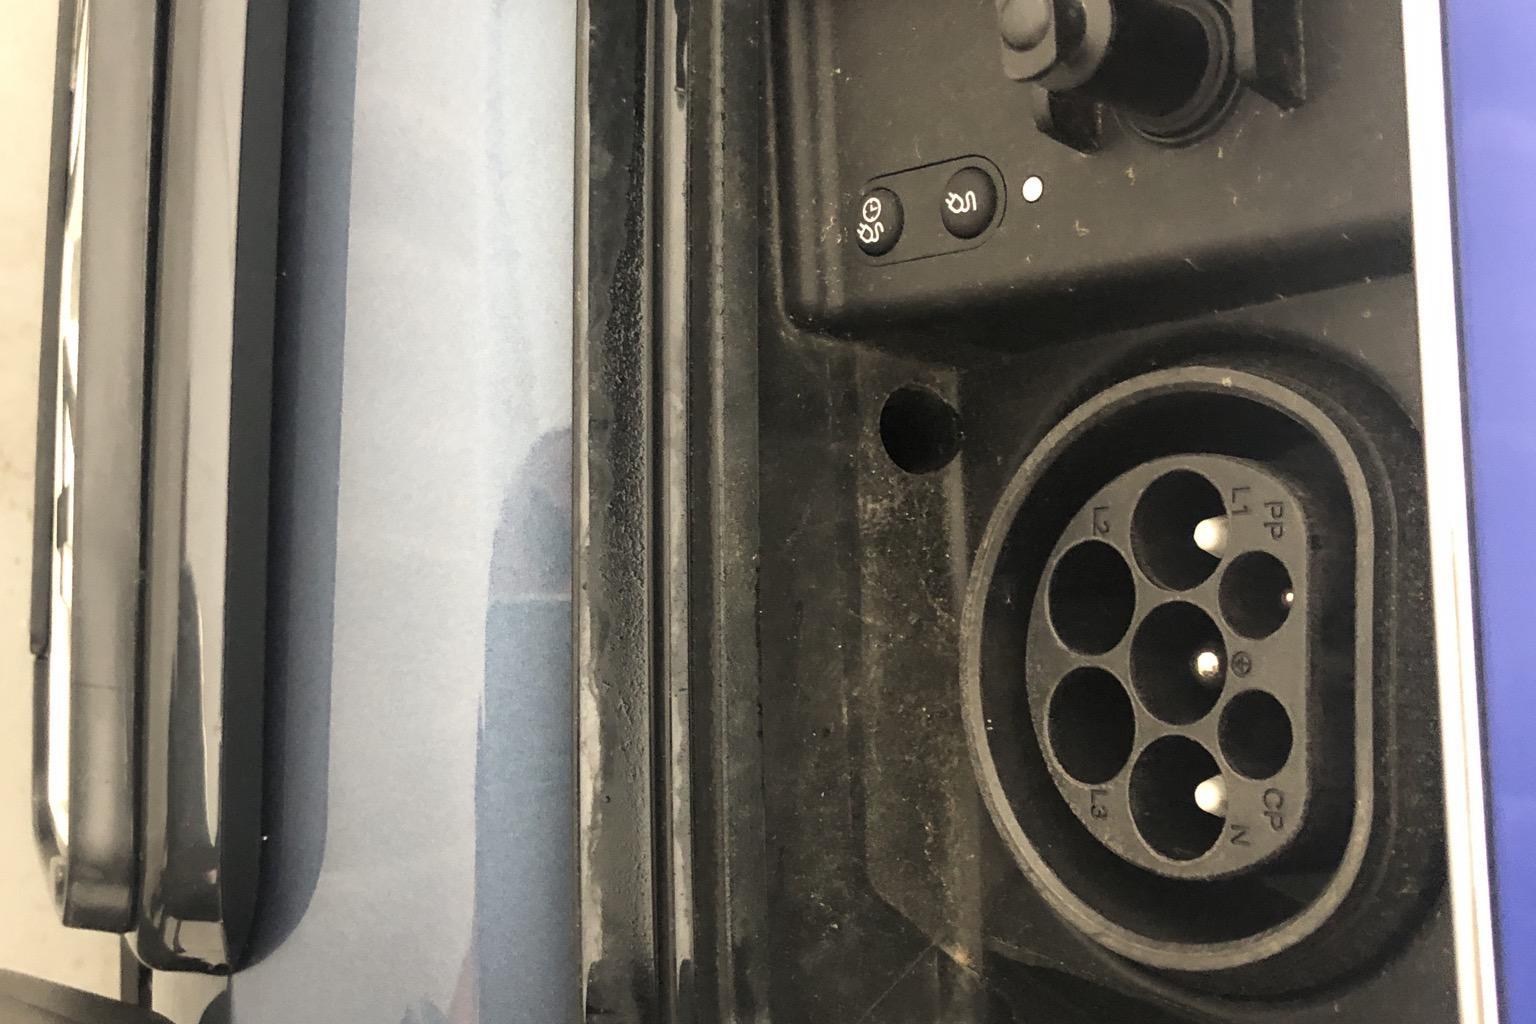 VW Passat 1.4 Plug-in-Hybrid Sportscombi (218hk) - 79 660 km - Automatic - blue - 2018